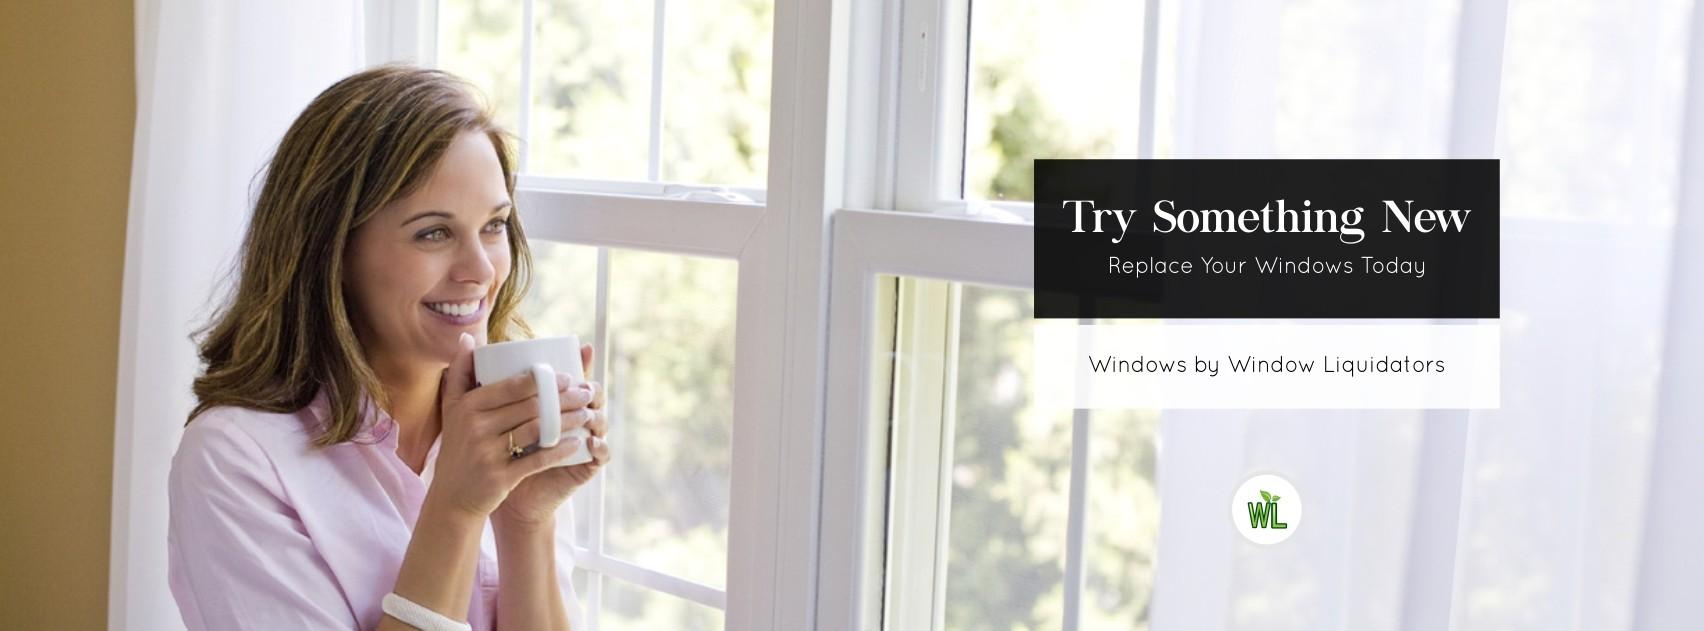 Window Liquidators | LinkedIn